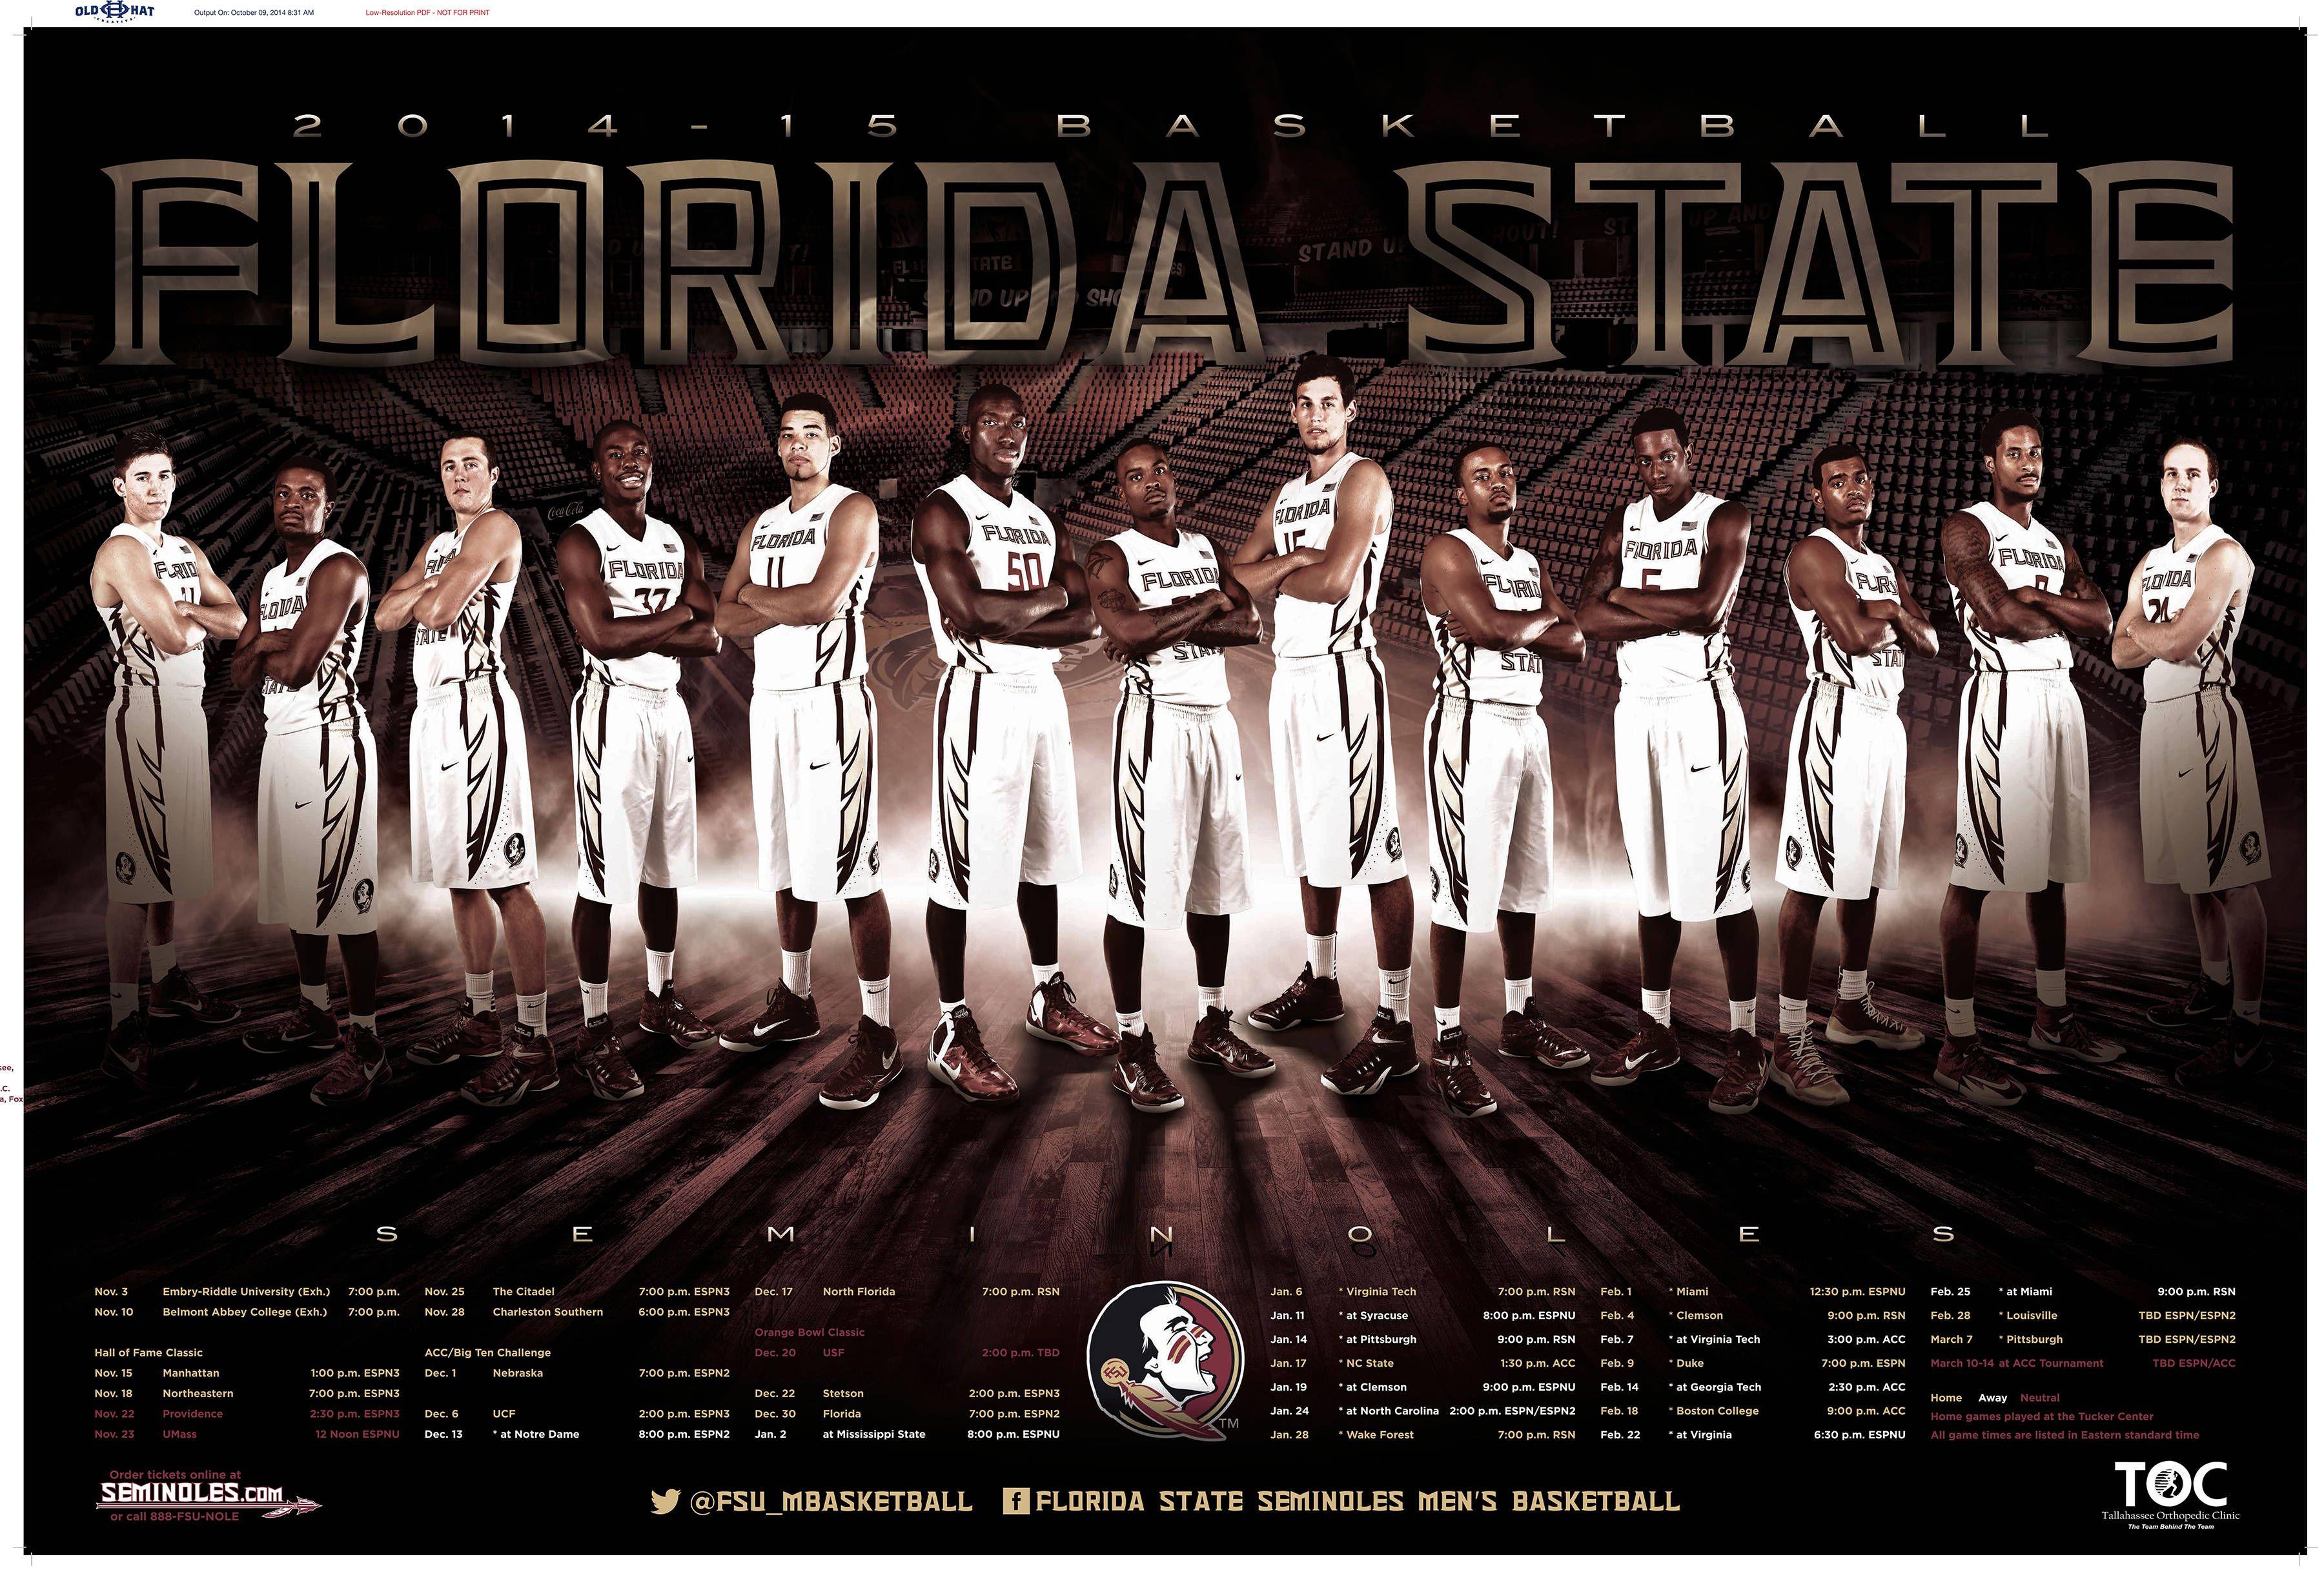 Basketball Team Poster Google Search Basketball Team Pictures Basketball Posters Sports Posters Basketball